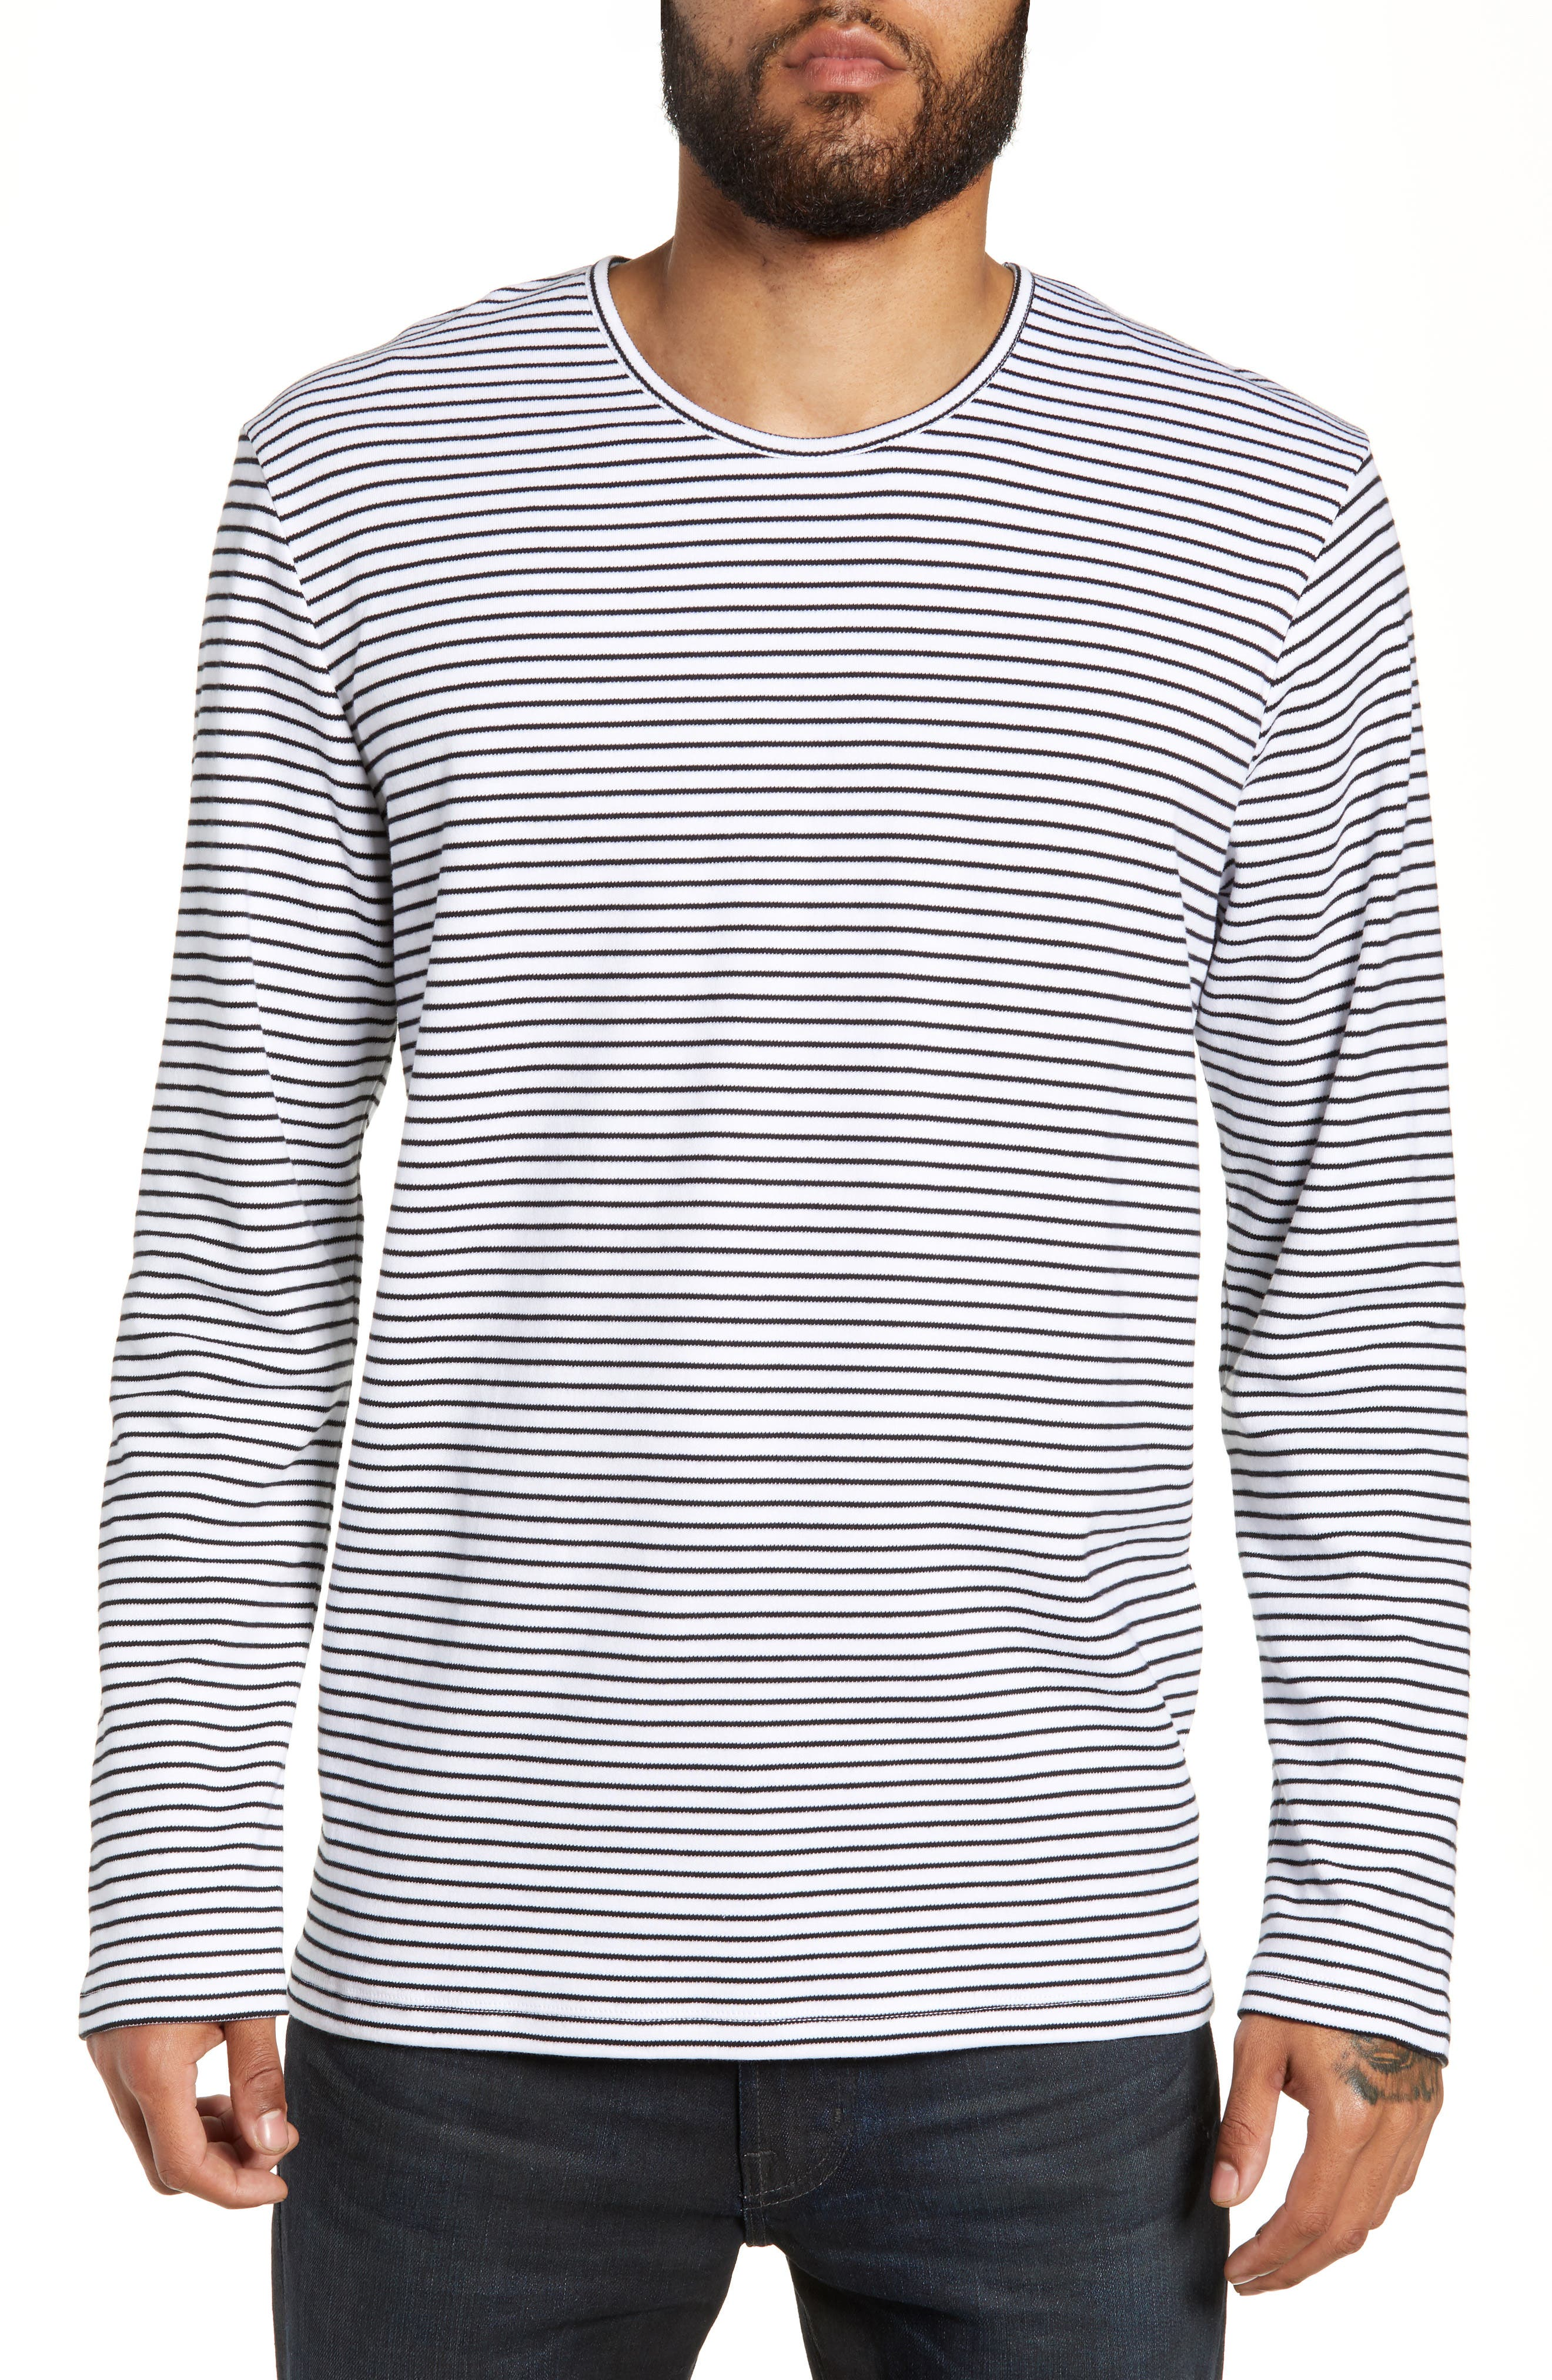 Finham Stripe Long Sleeve T-Shirt,                             Main thumbnail 1, color,                             WHITE / BLACK STRIPE